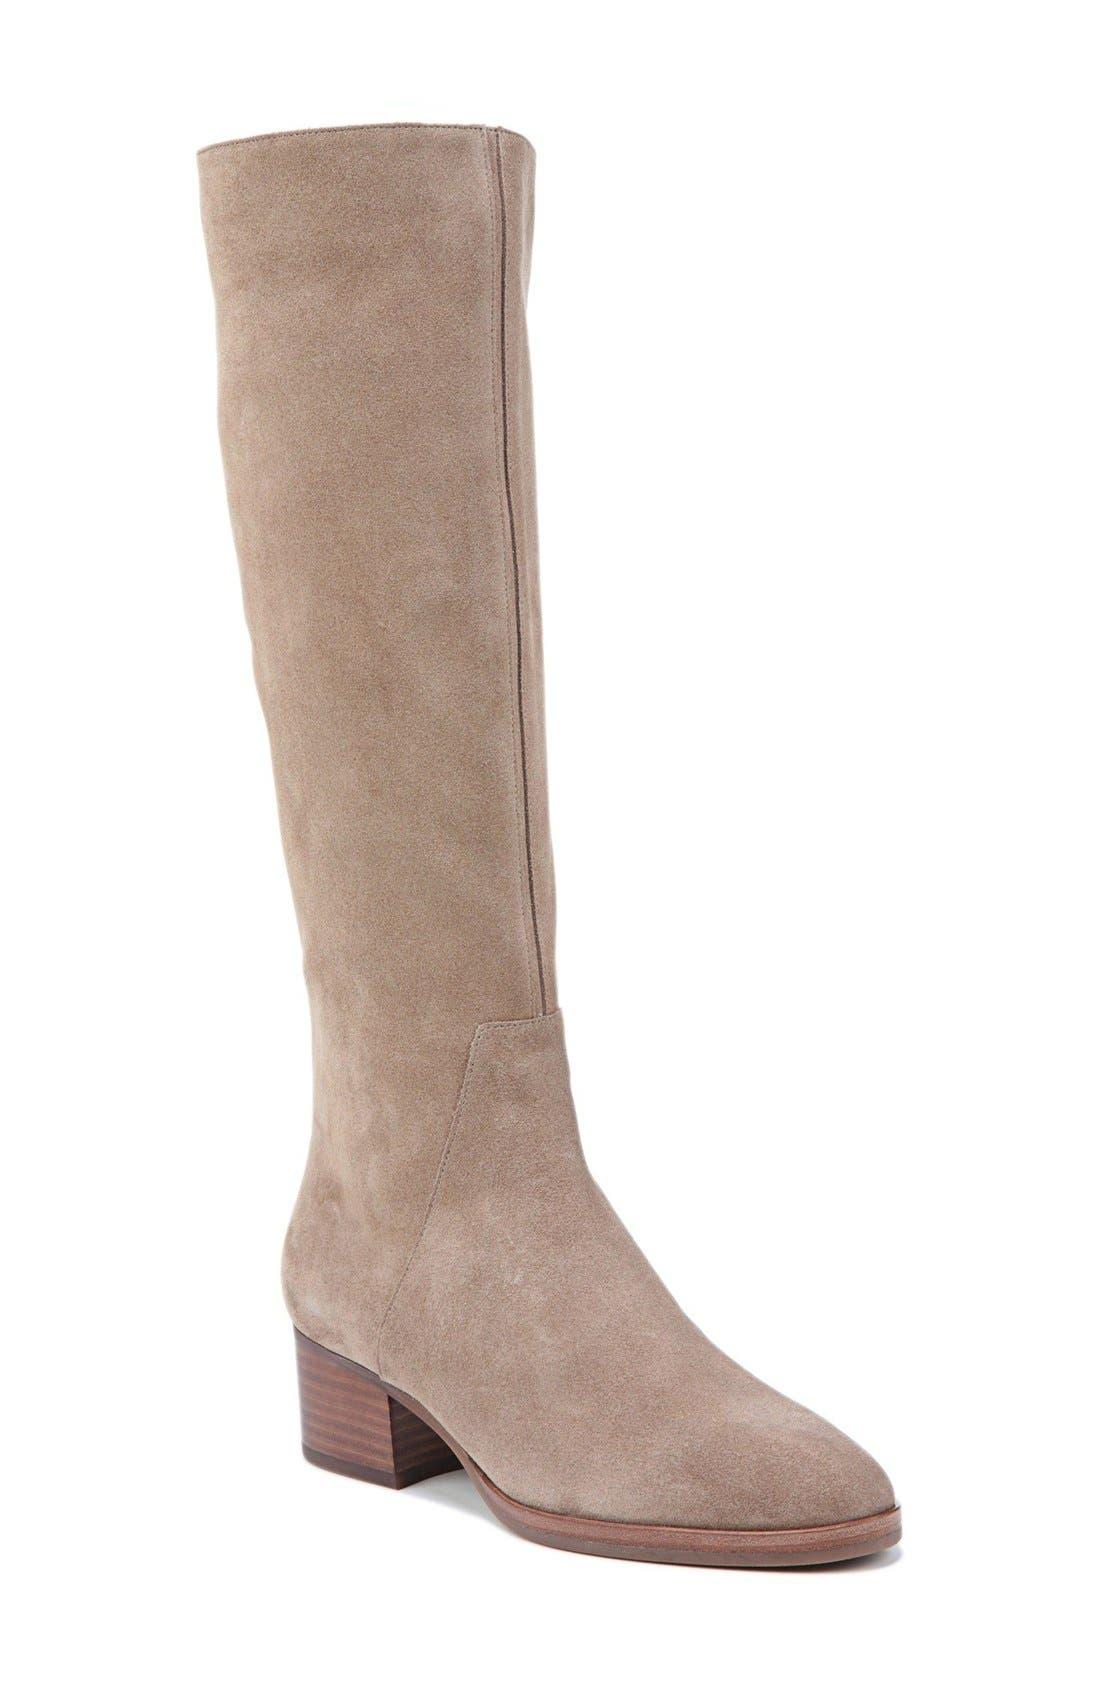 Alternate Image 1 Selected - Via Spiga 'Odella' Tall Boot (Women)